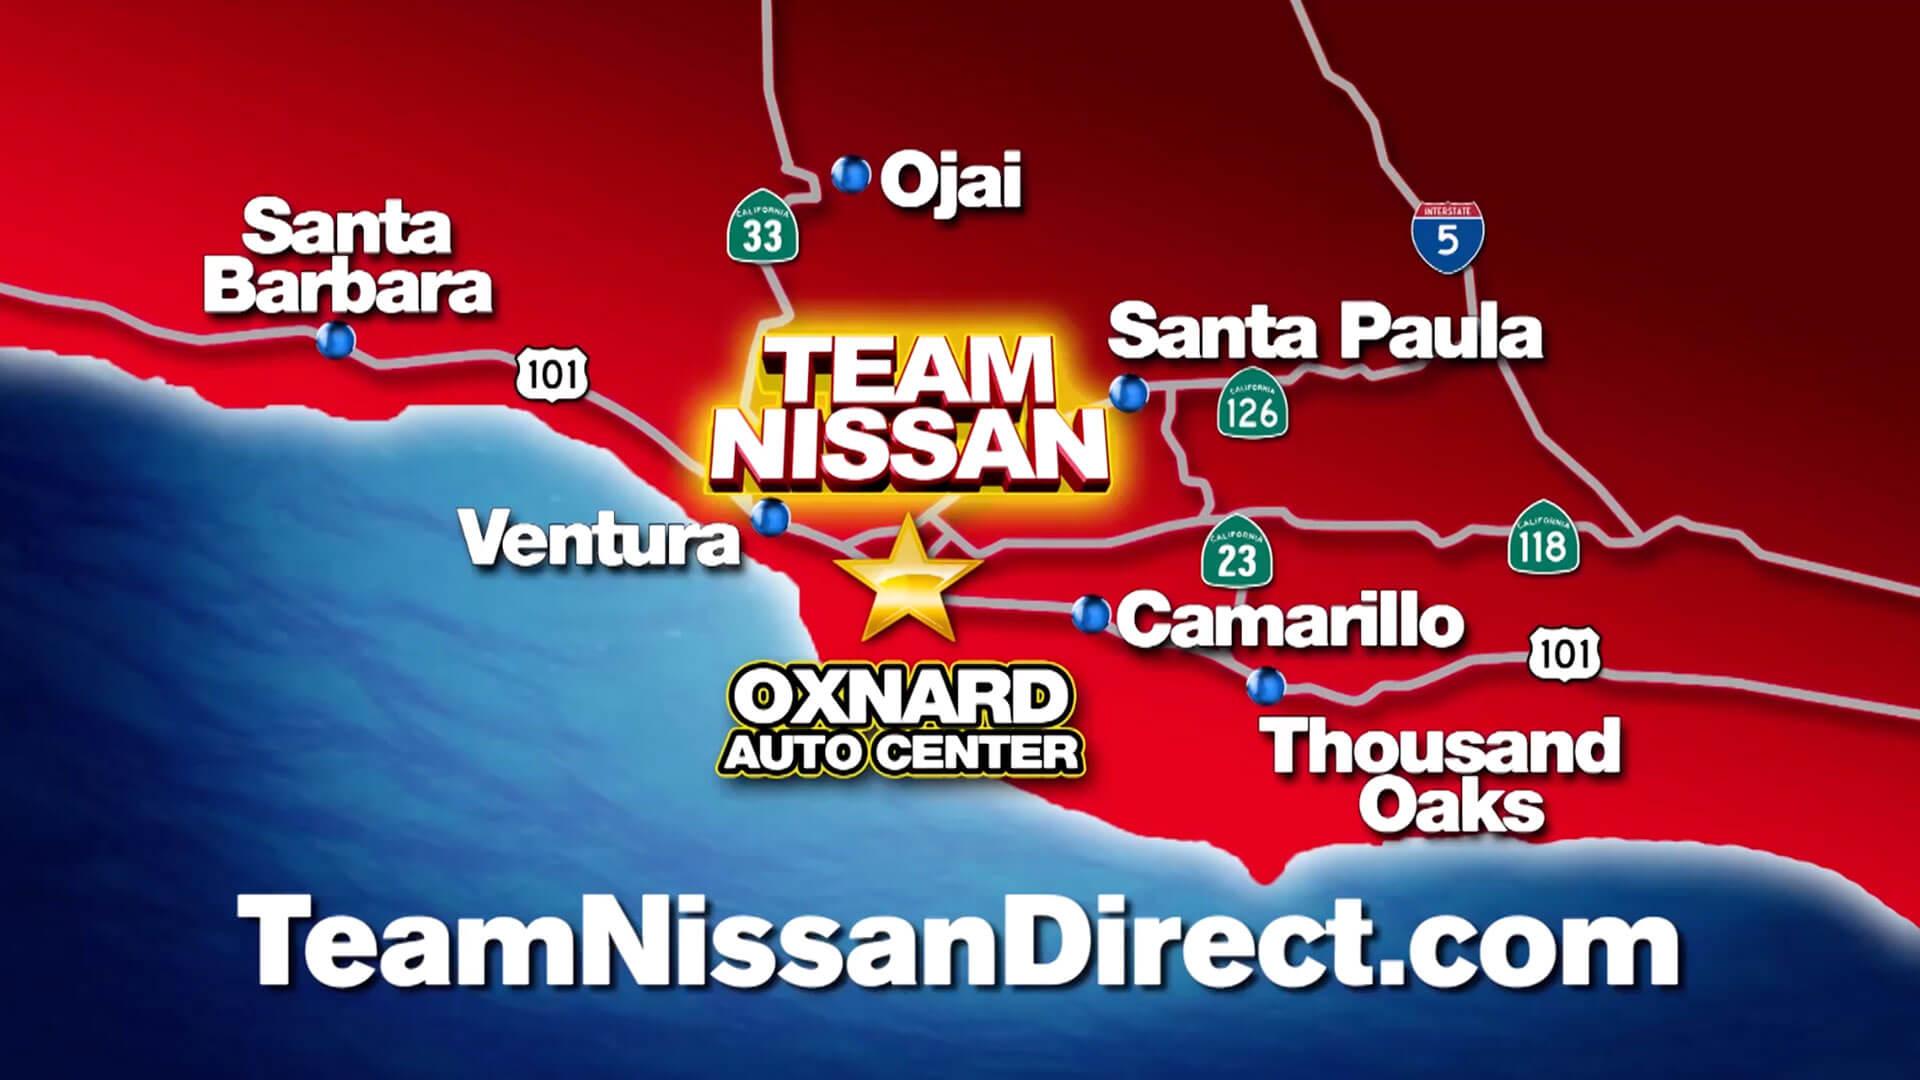 Team Nissan